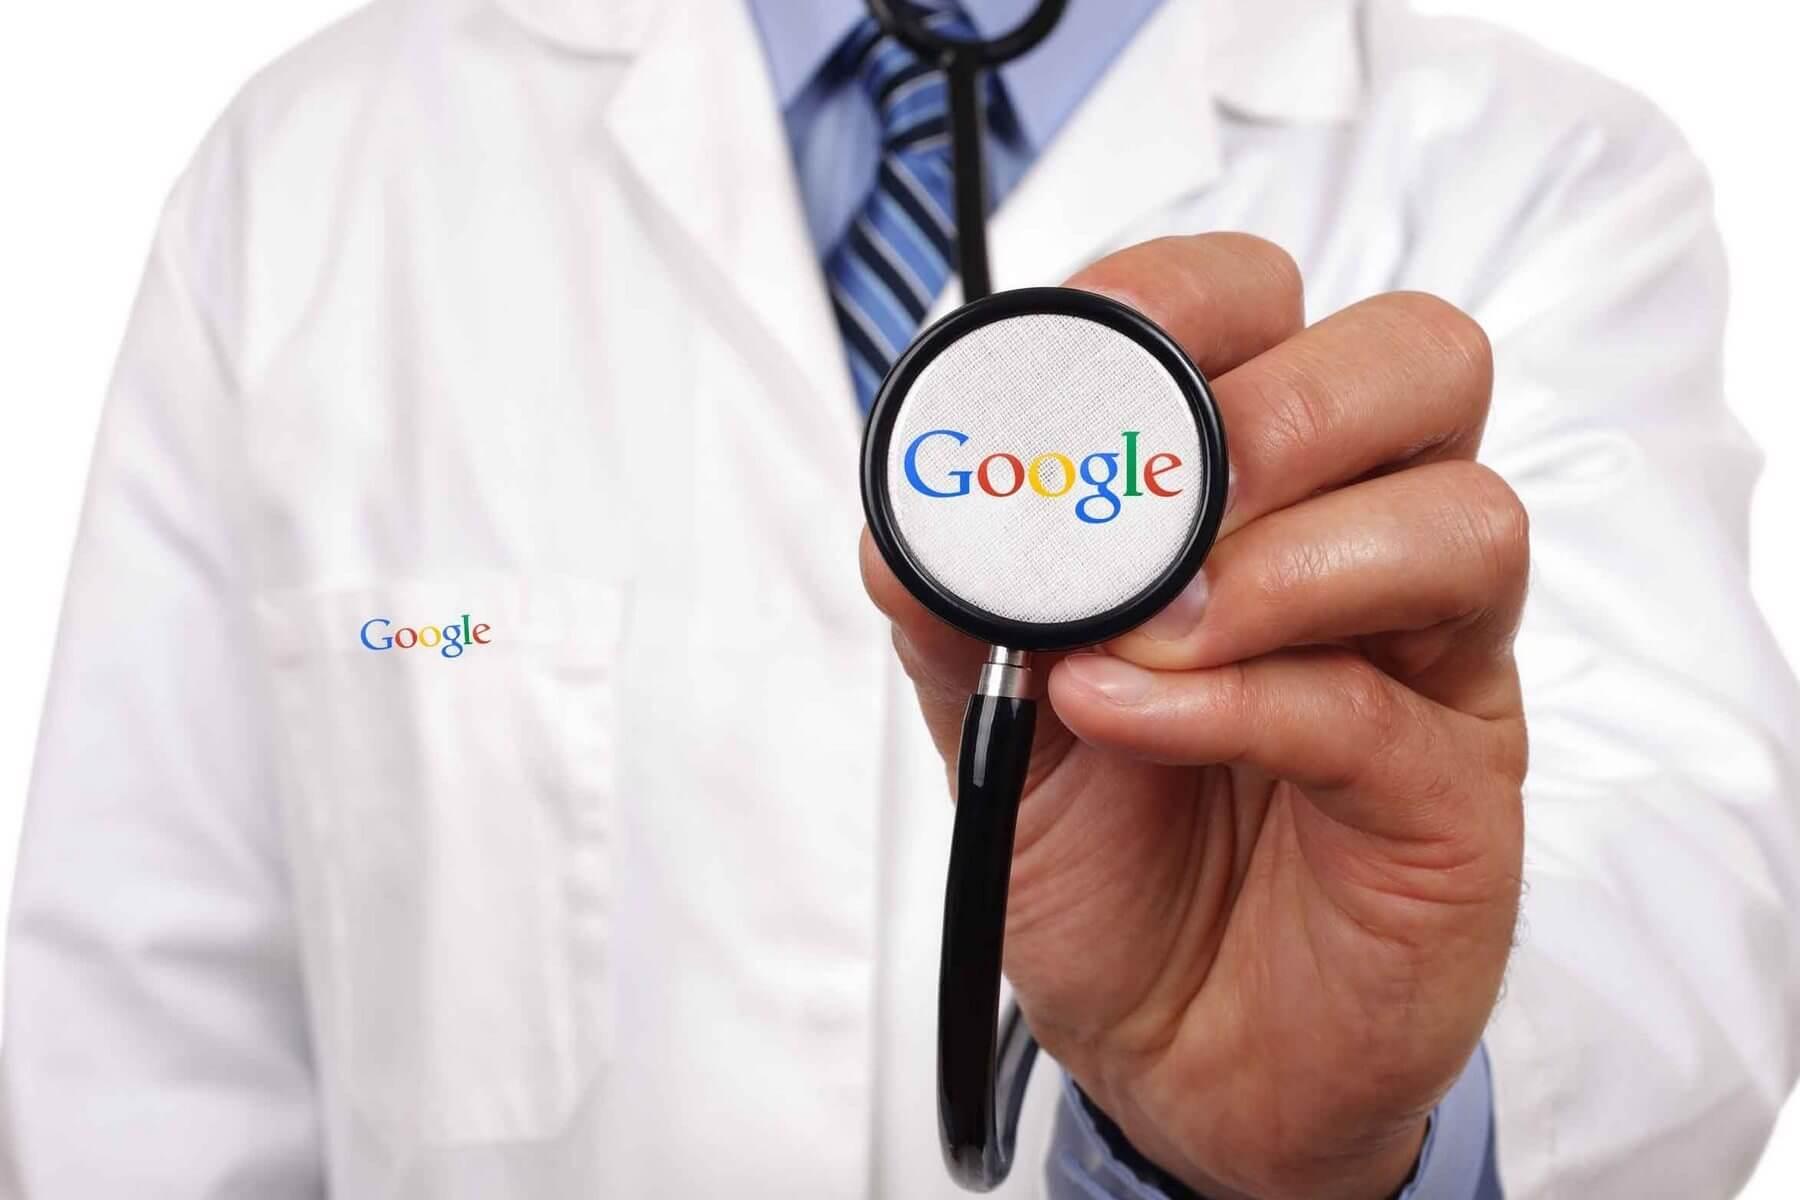 smt-GoogleMed-P1